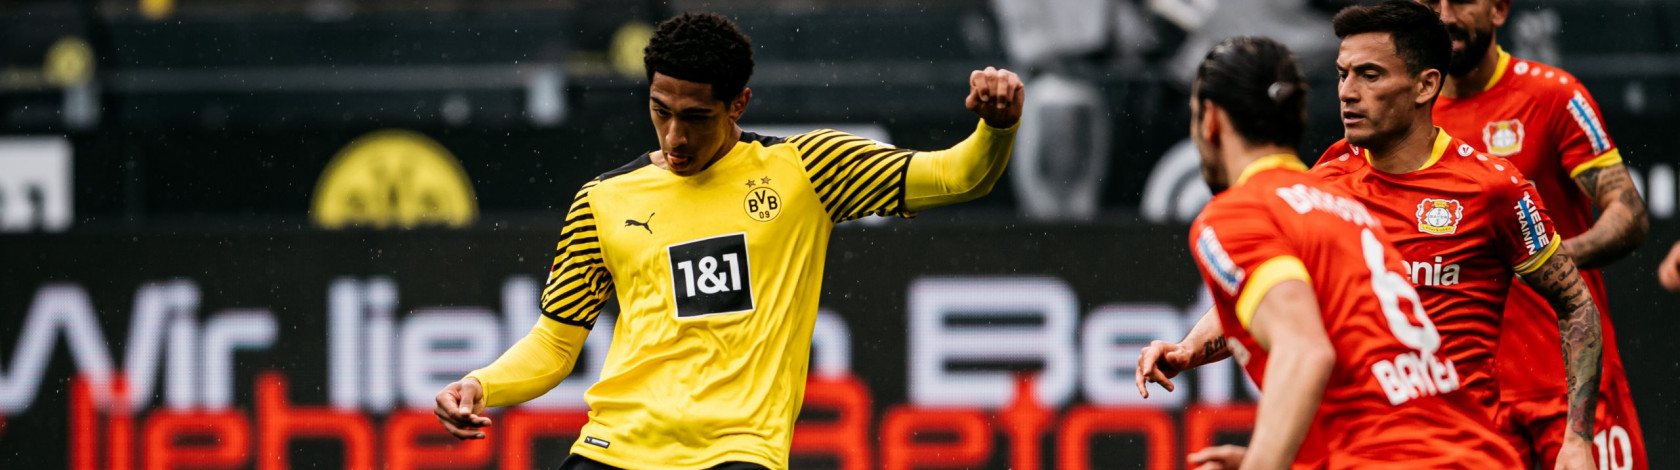 Borussia Dortmund v Bayer 04 Leverkusen – Bundesliga for DFL